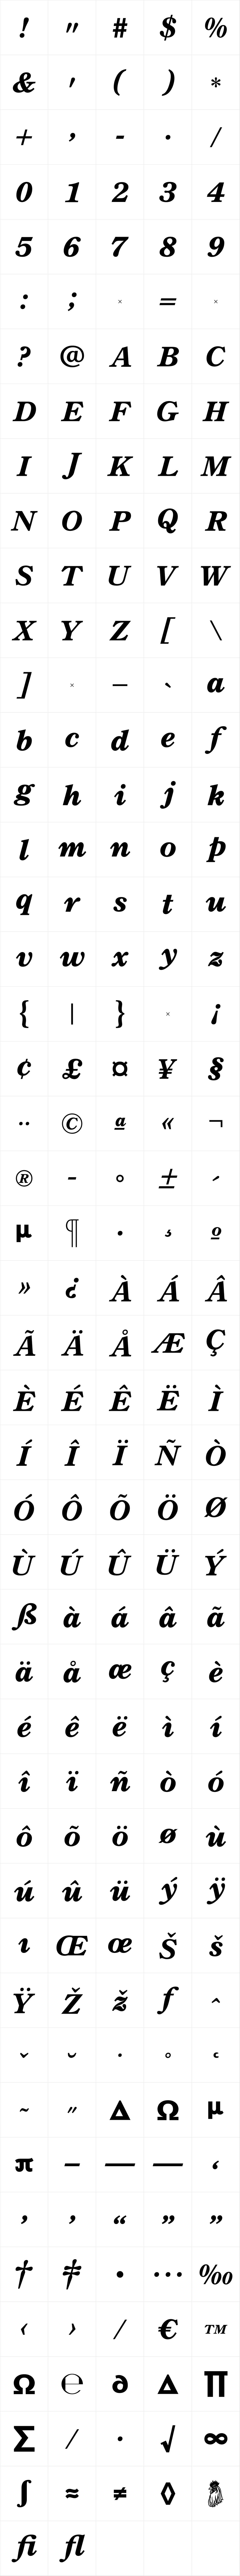 TCCenturyNewStyle Bold Italic